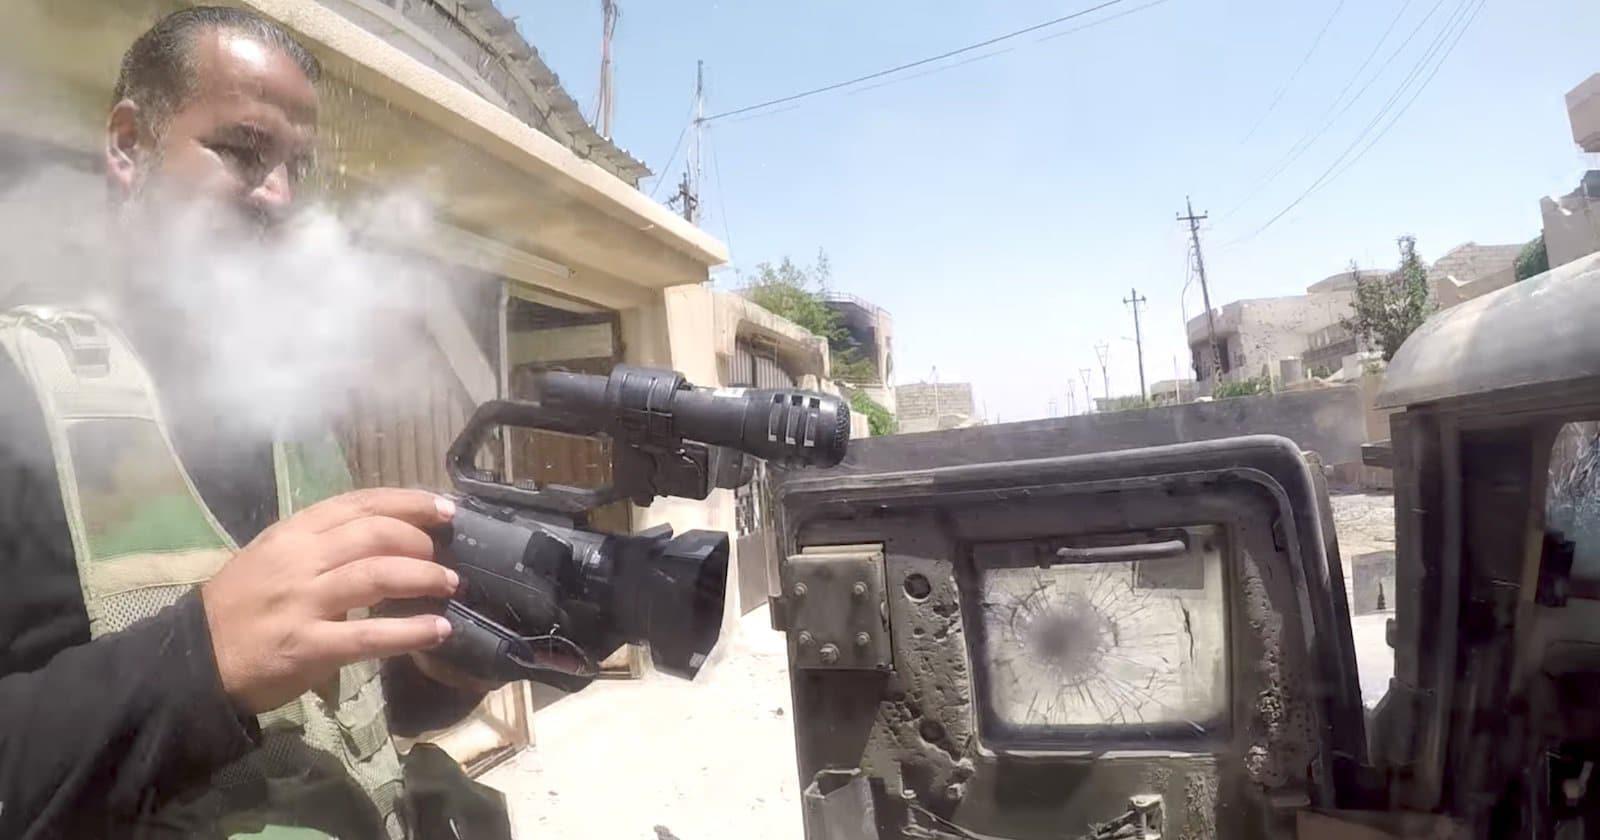 gopro-salva-a-vida-de-jornalista-iraquiano-em-zona-de-guerra-no-iraque-eMania-19-05